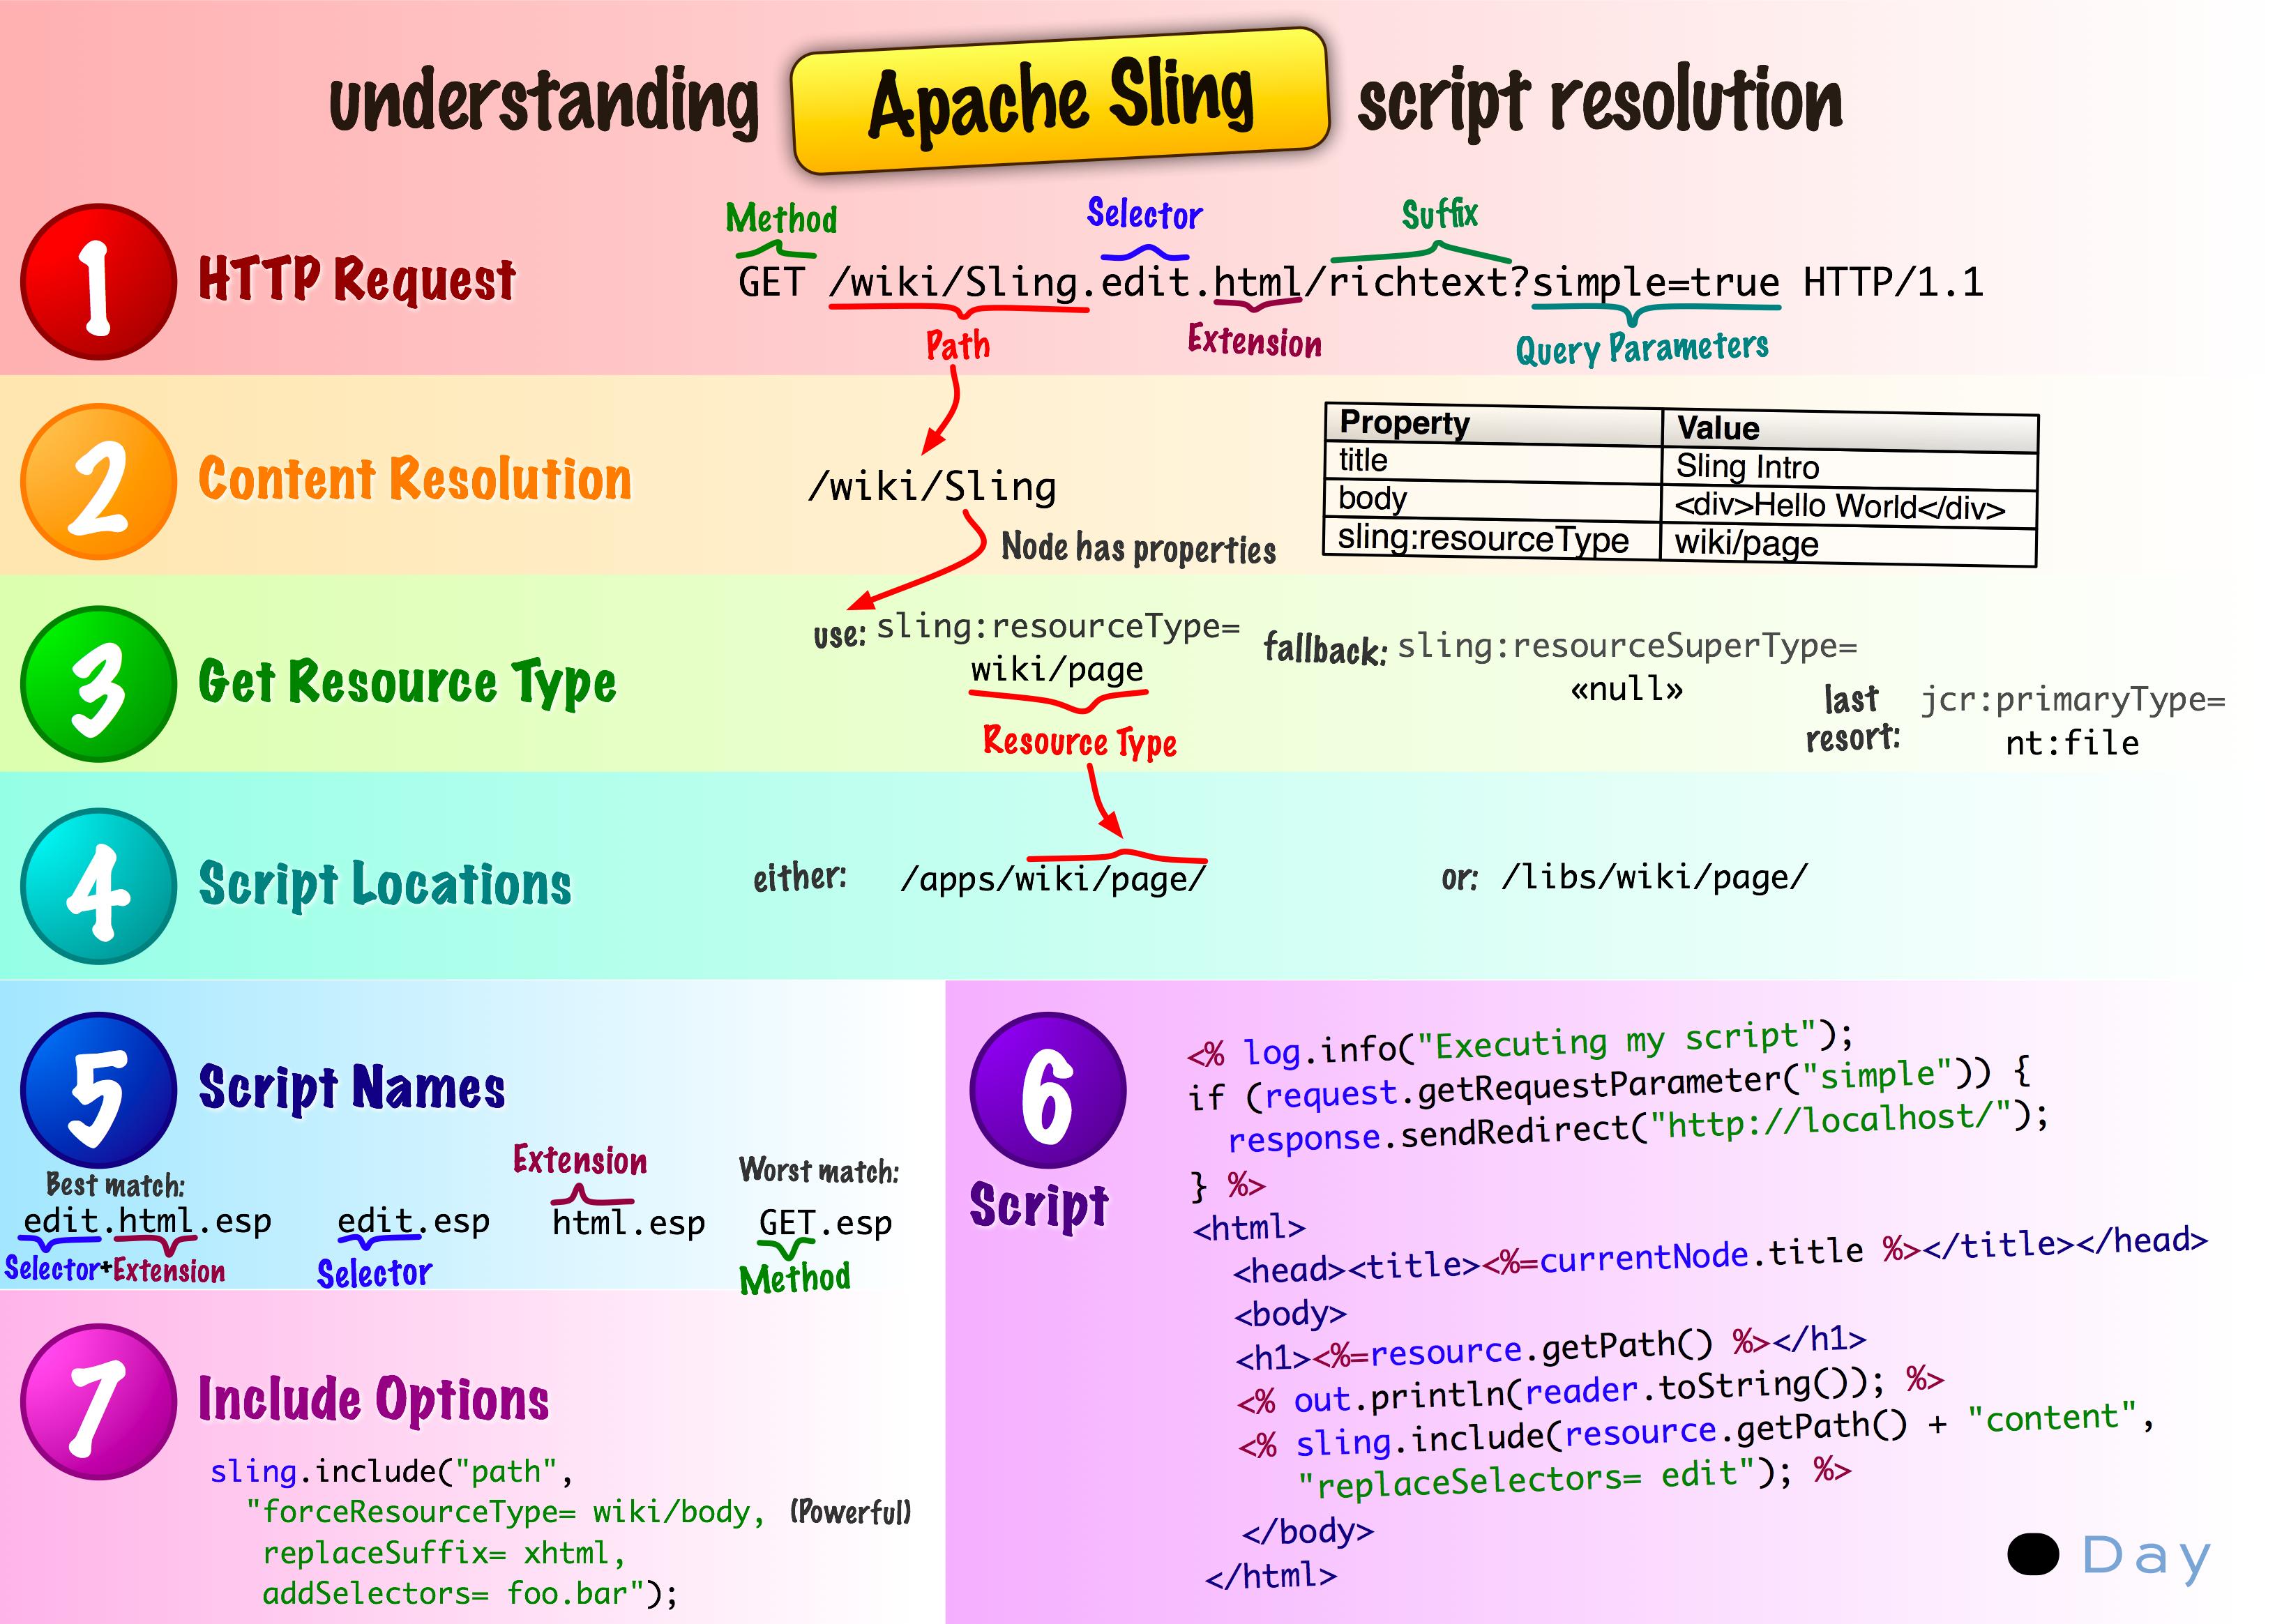 Apache Sling Script Resolution Cheat Sheet   Tech-Cheat-Sheets ...